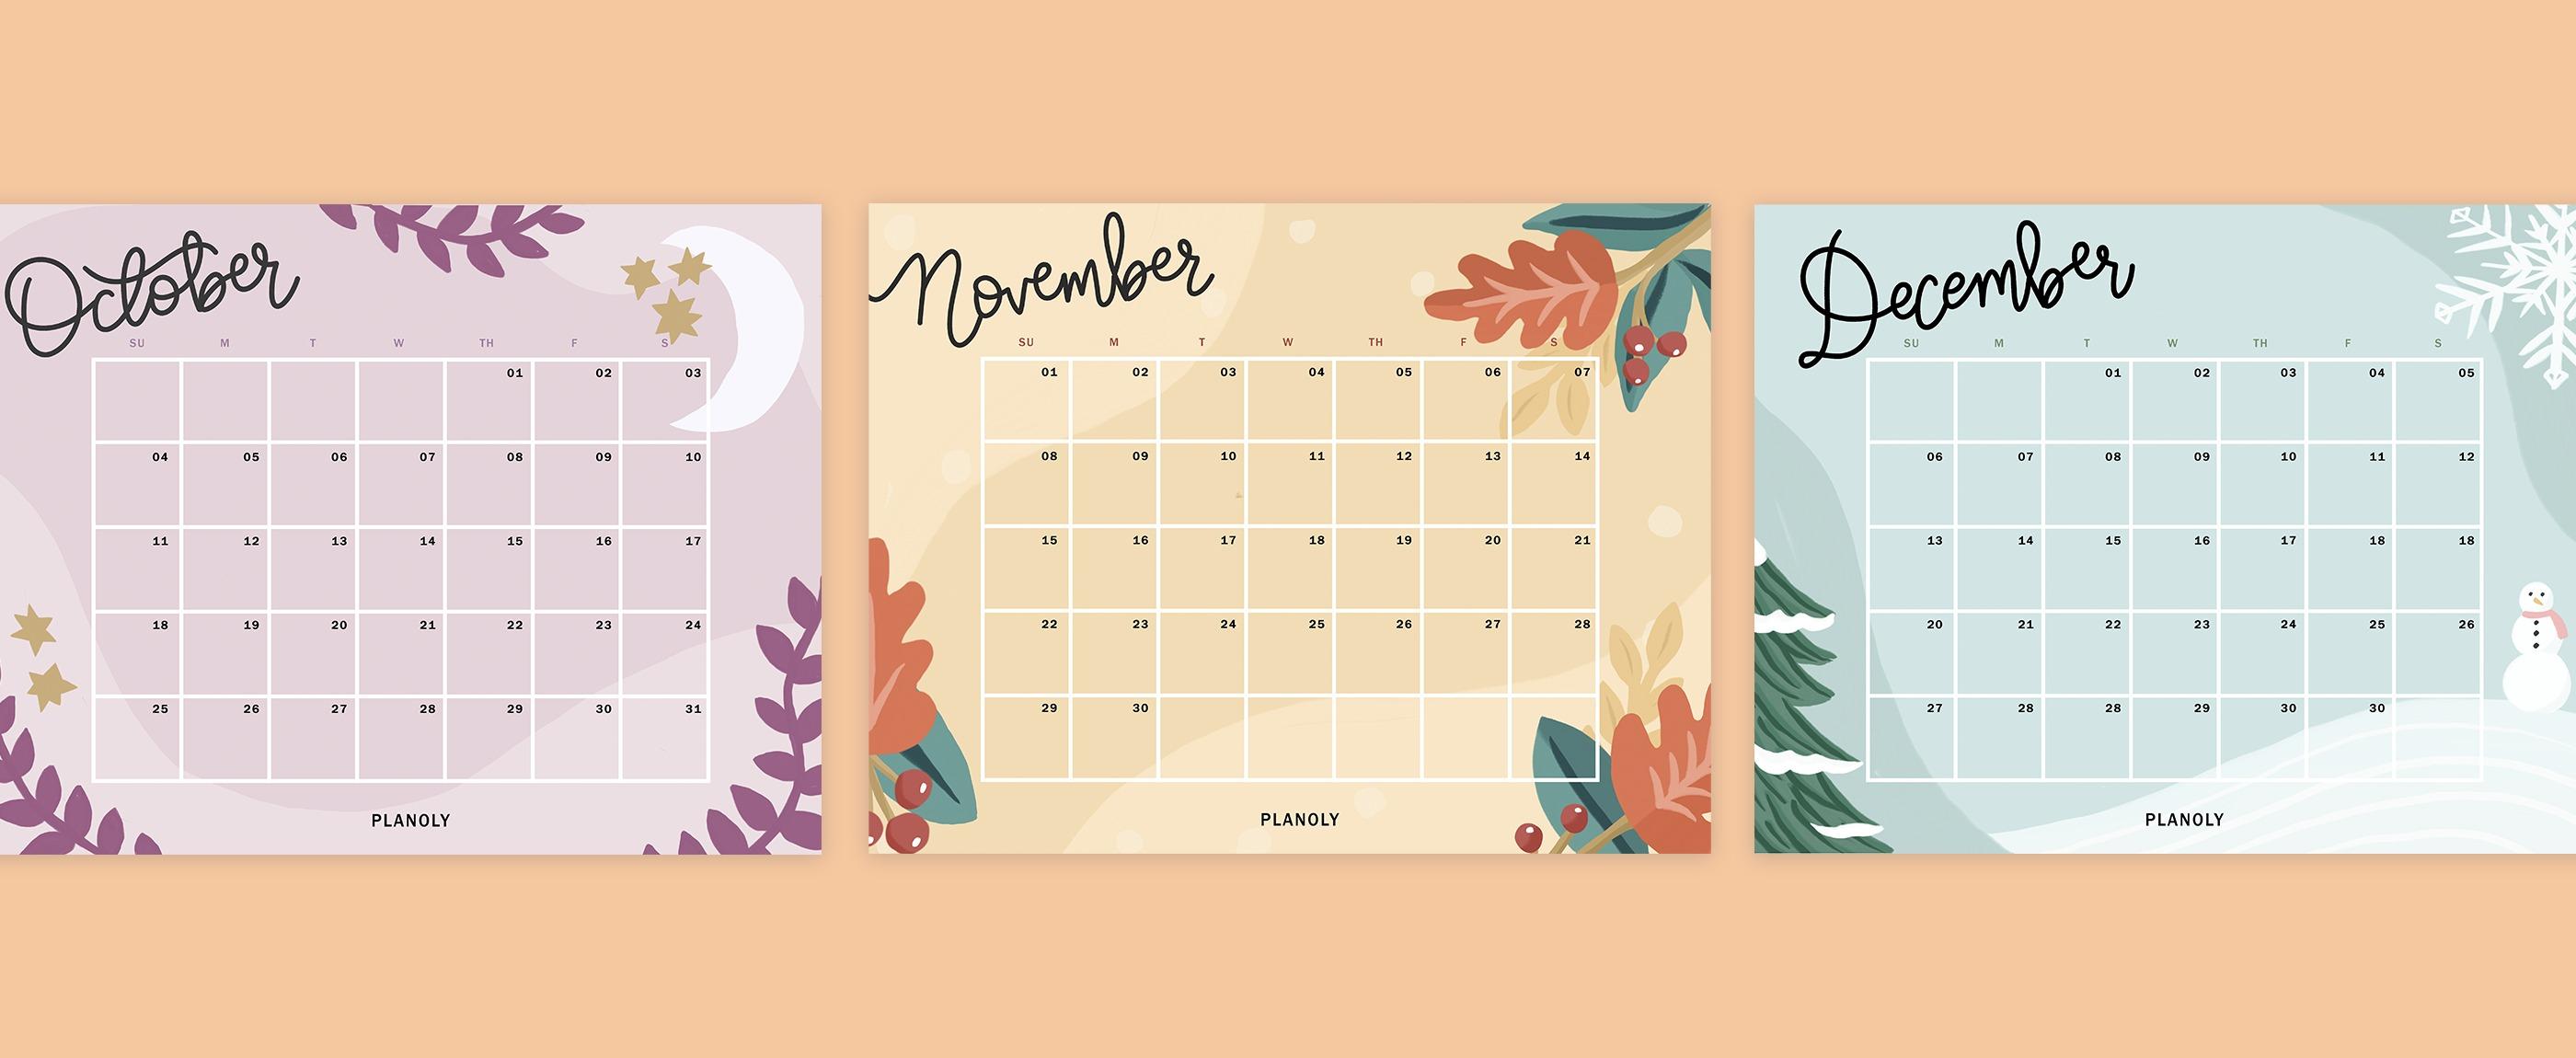 PLANOLY-blog post- Q4 2020 Content Calendars - banner